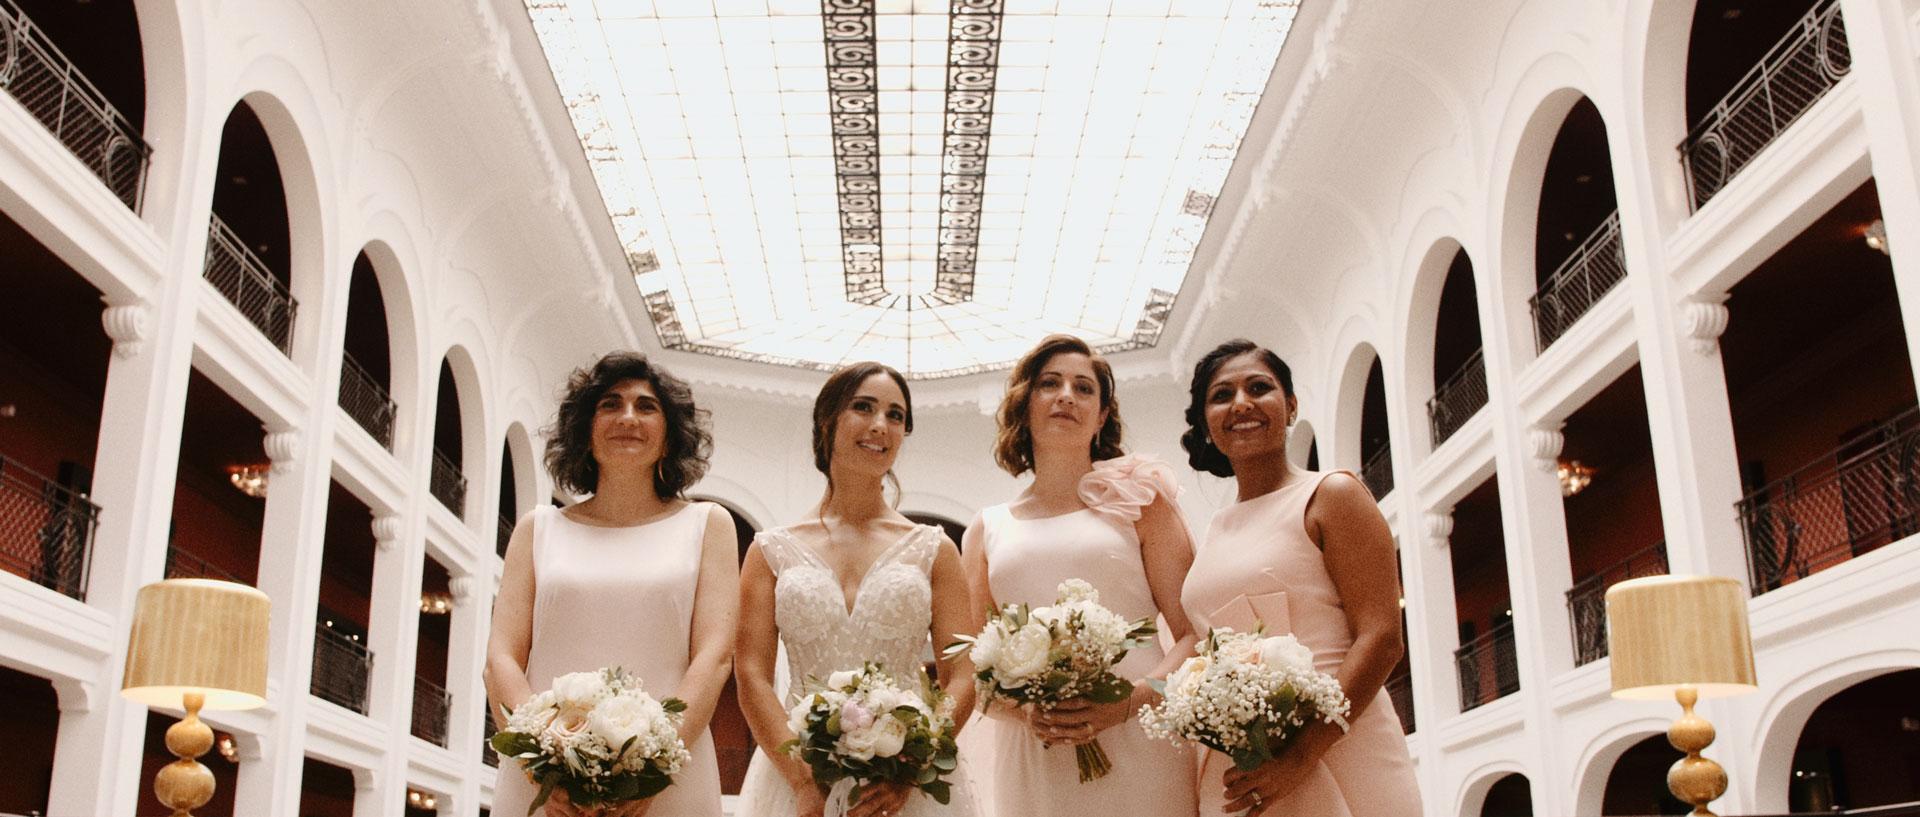 Natasha & Jad Wedding - Casino Biarritz (25).jpg